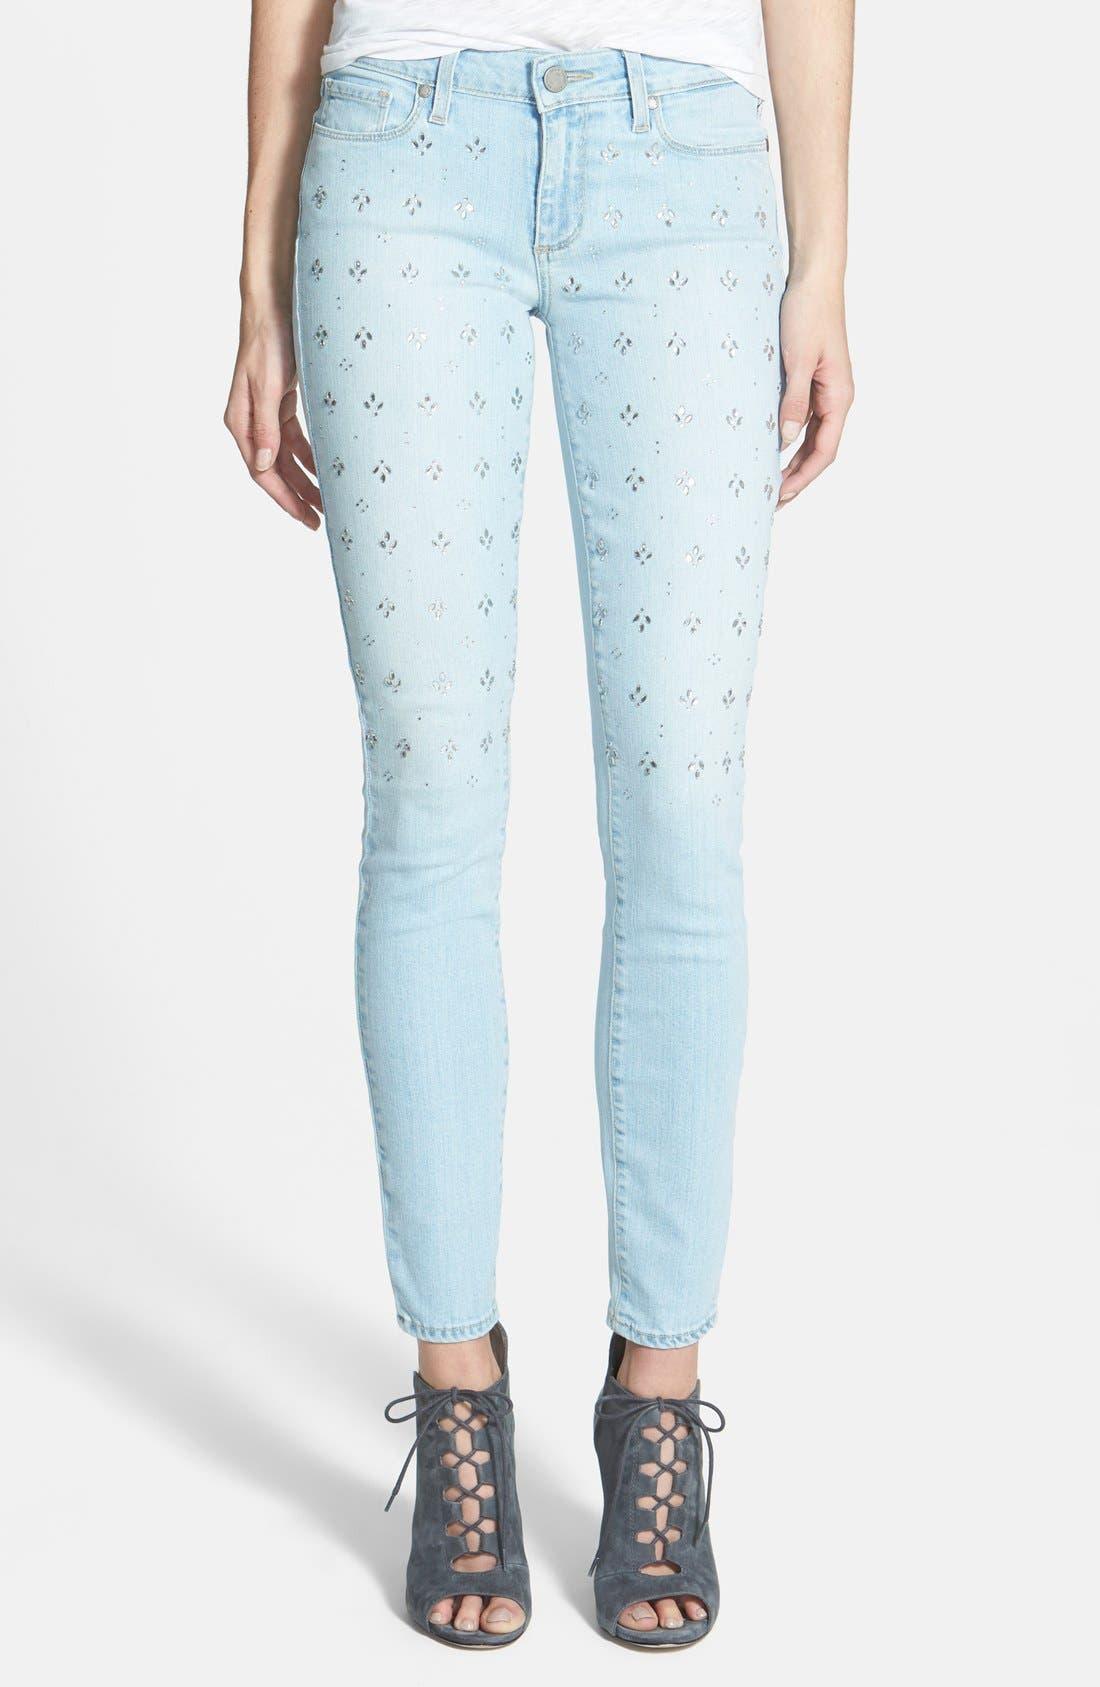 Alternate Image 1 Selected - Paige Denim 'Verdugo' Ultra Skinny Jeans (Naomi Embellished)